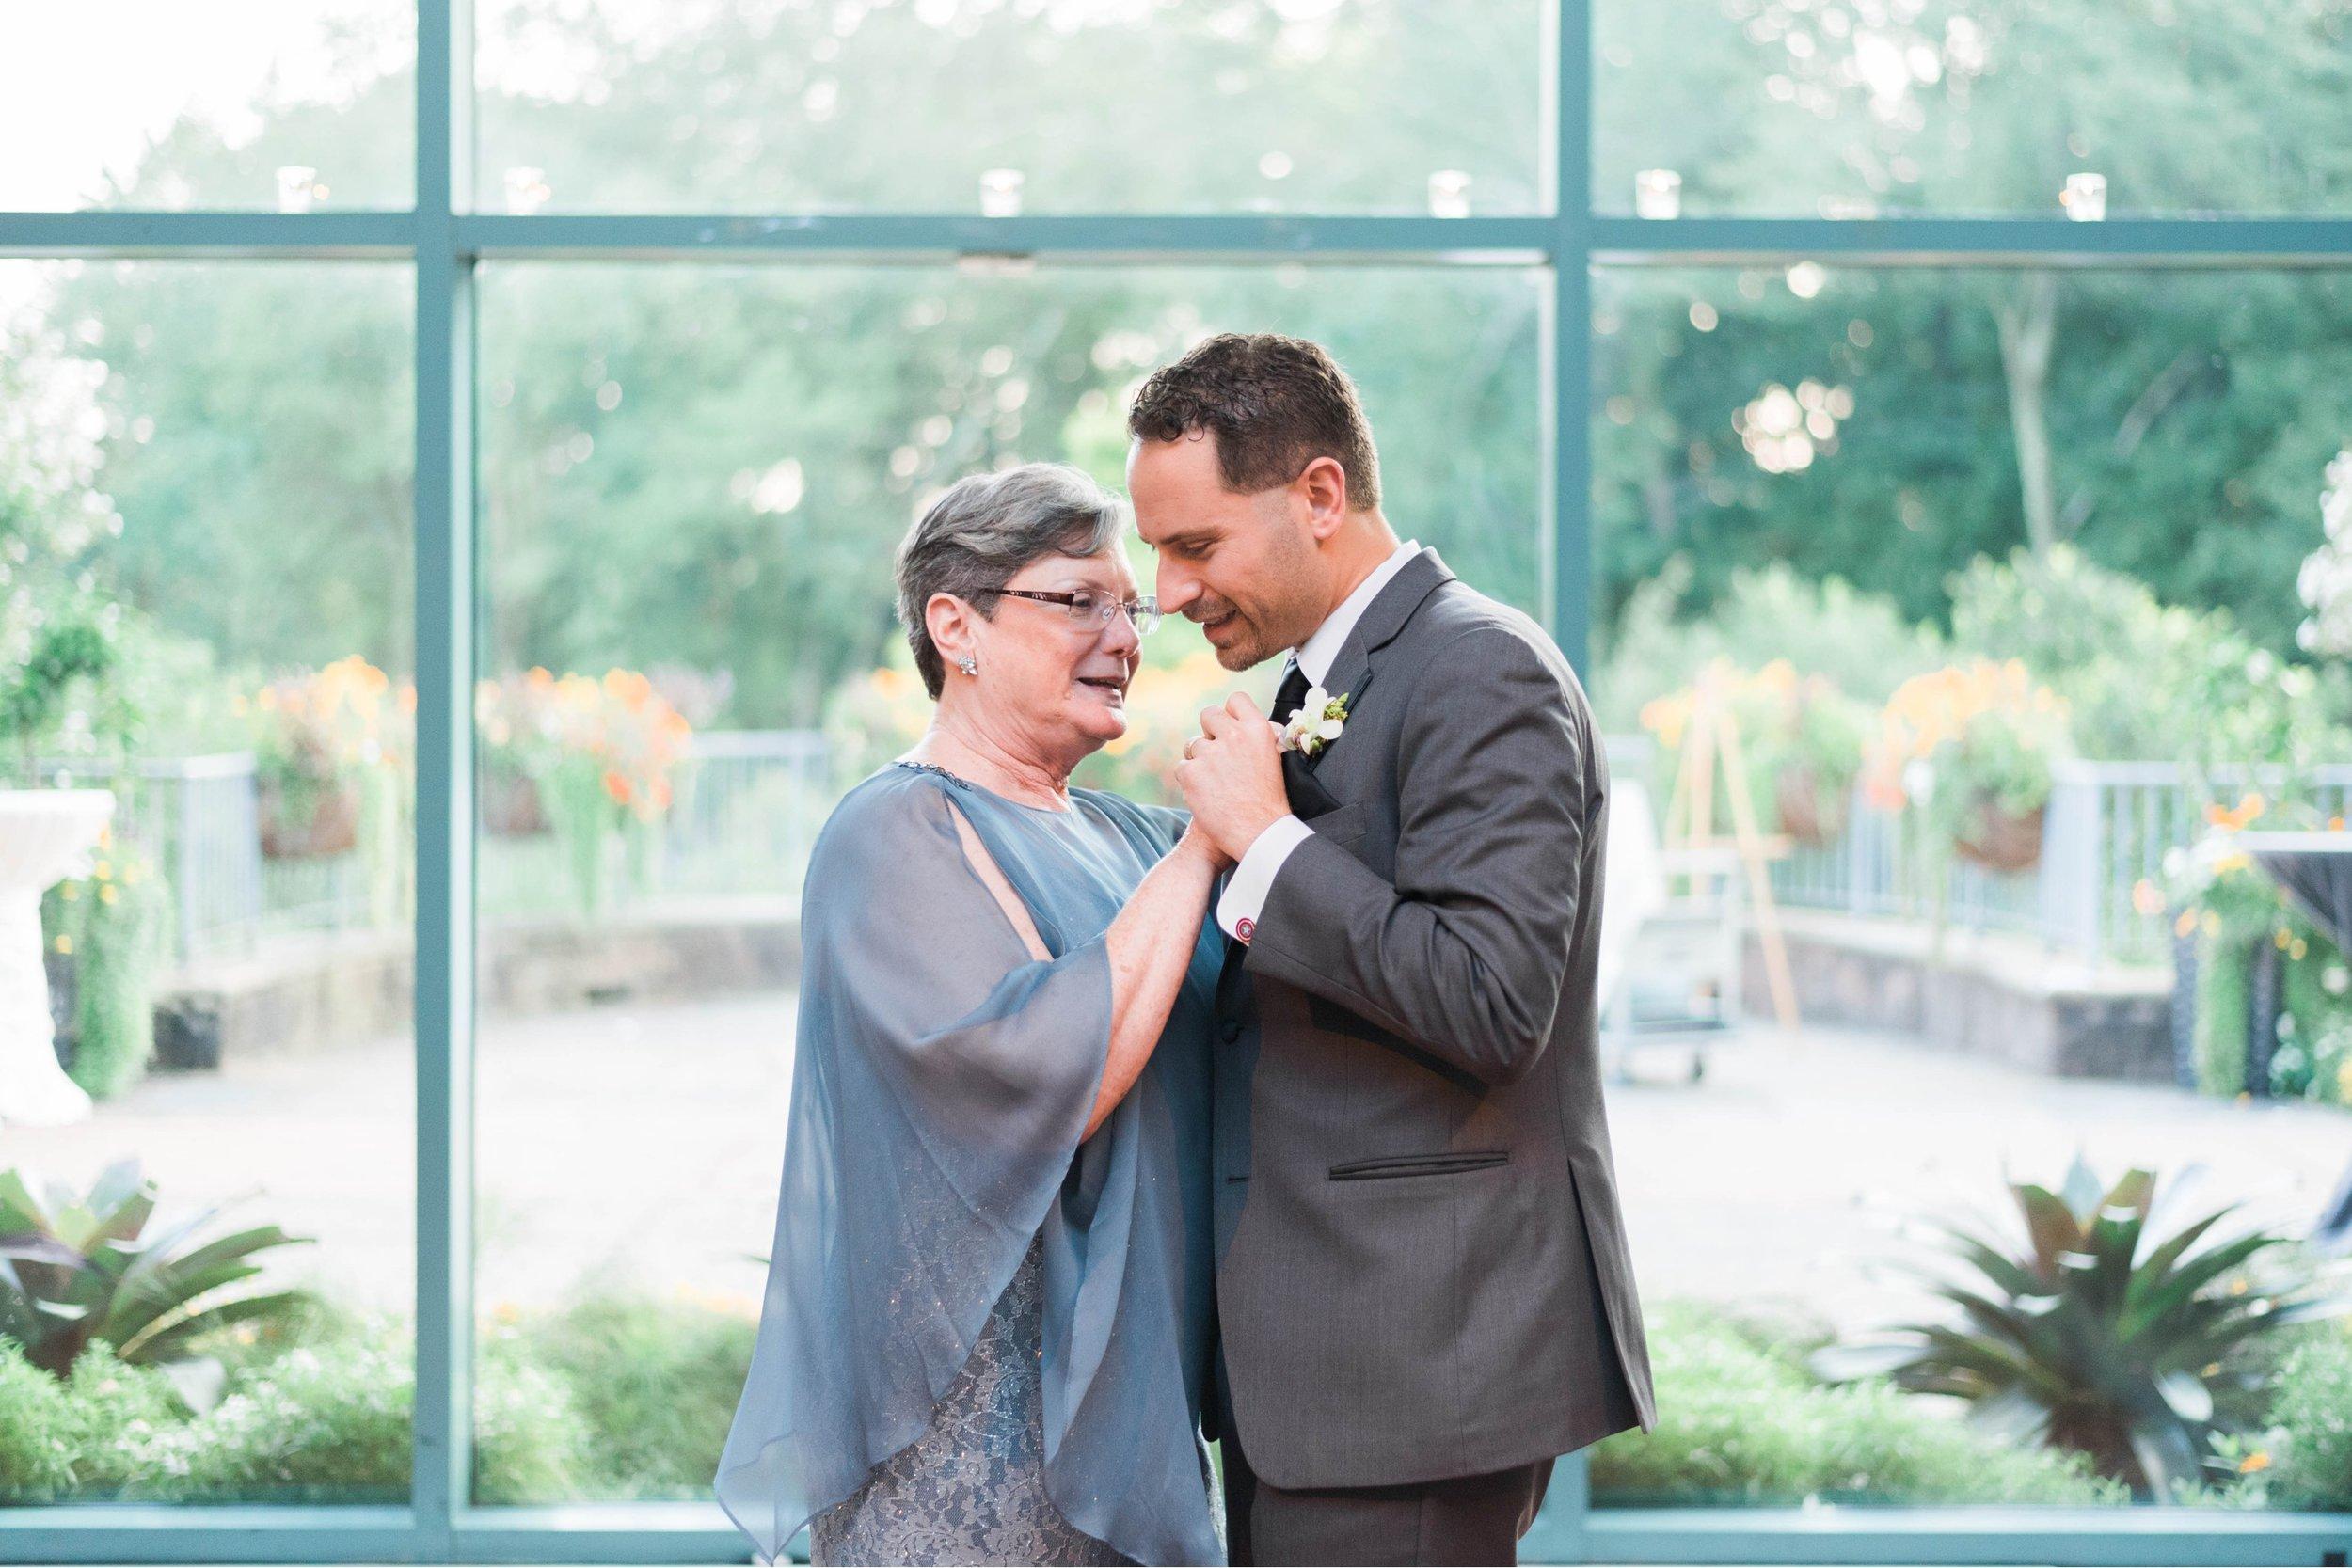 TheAtriumatMeadowlark_Virginiawedding photographer_lynchburgweddingphotographer_DCweddingPhotographer_KristinAaron 49.jpg